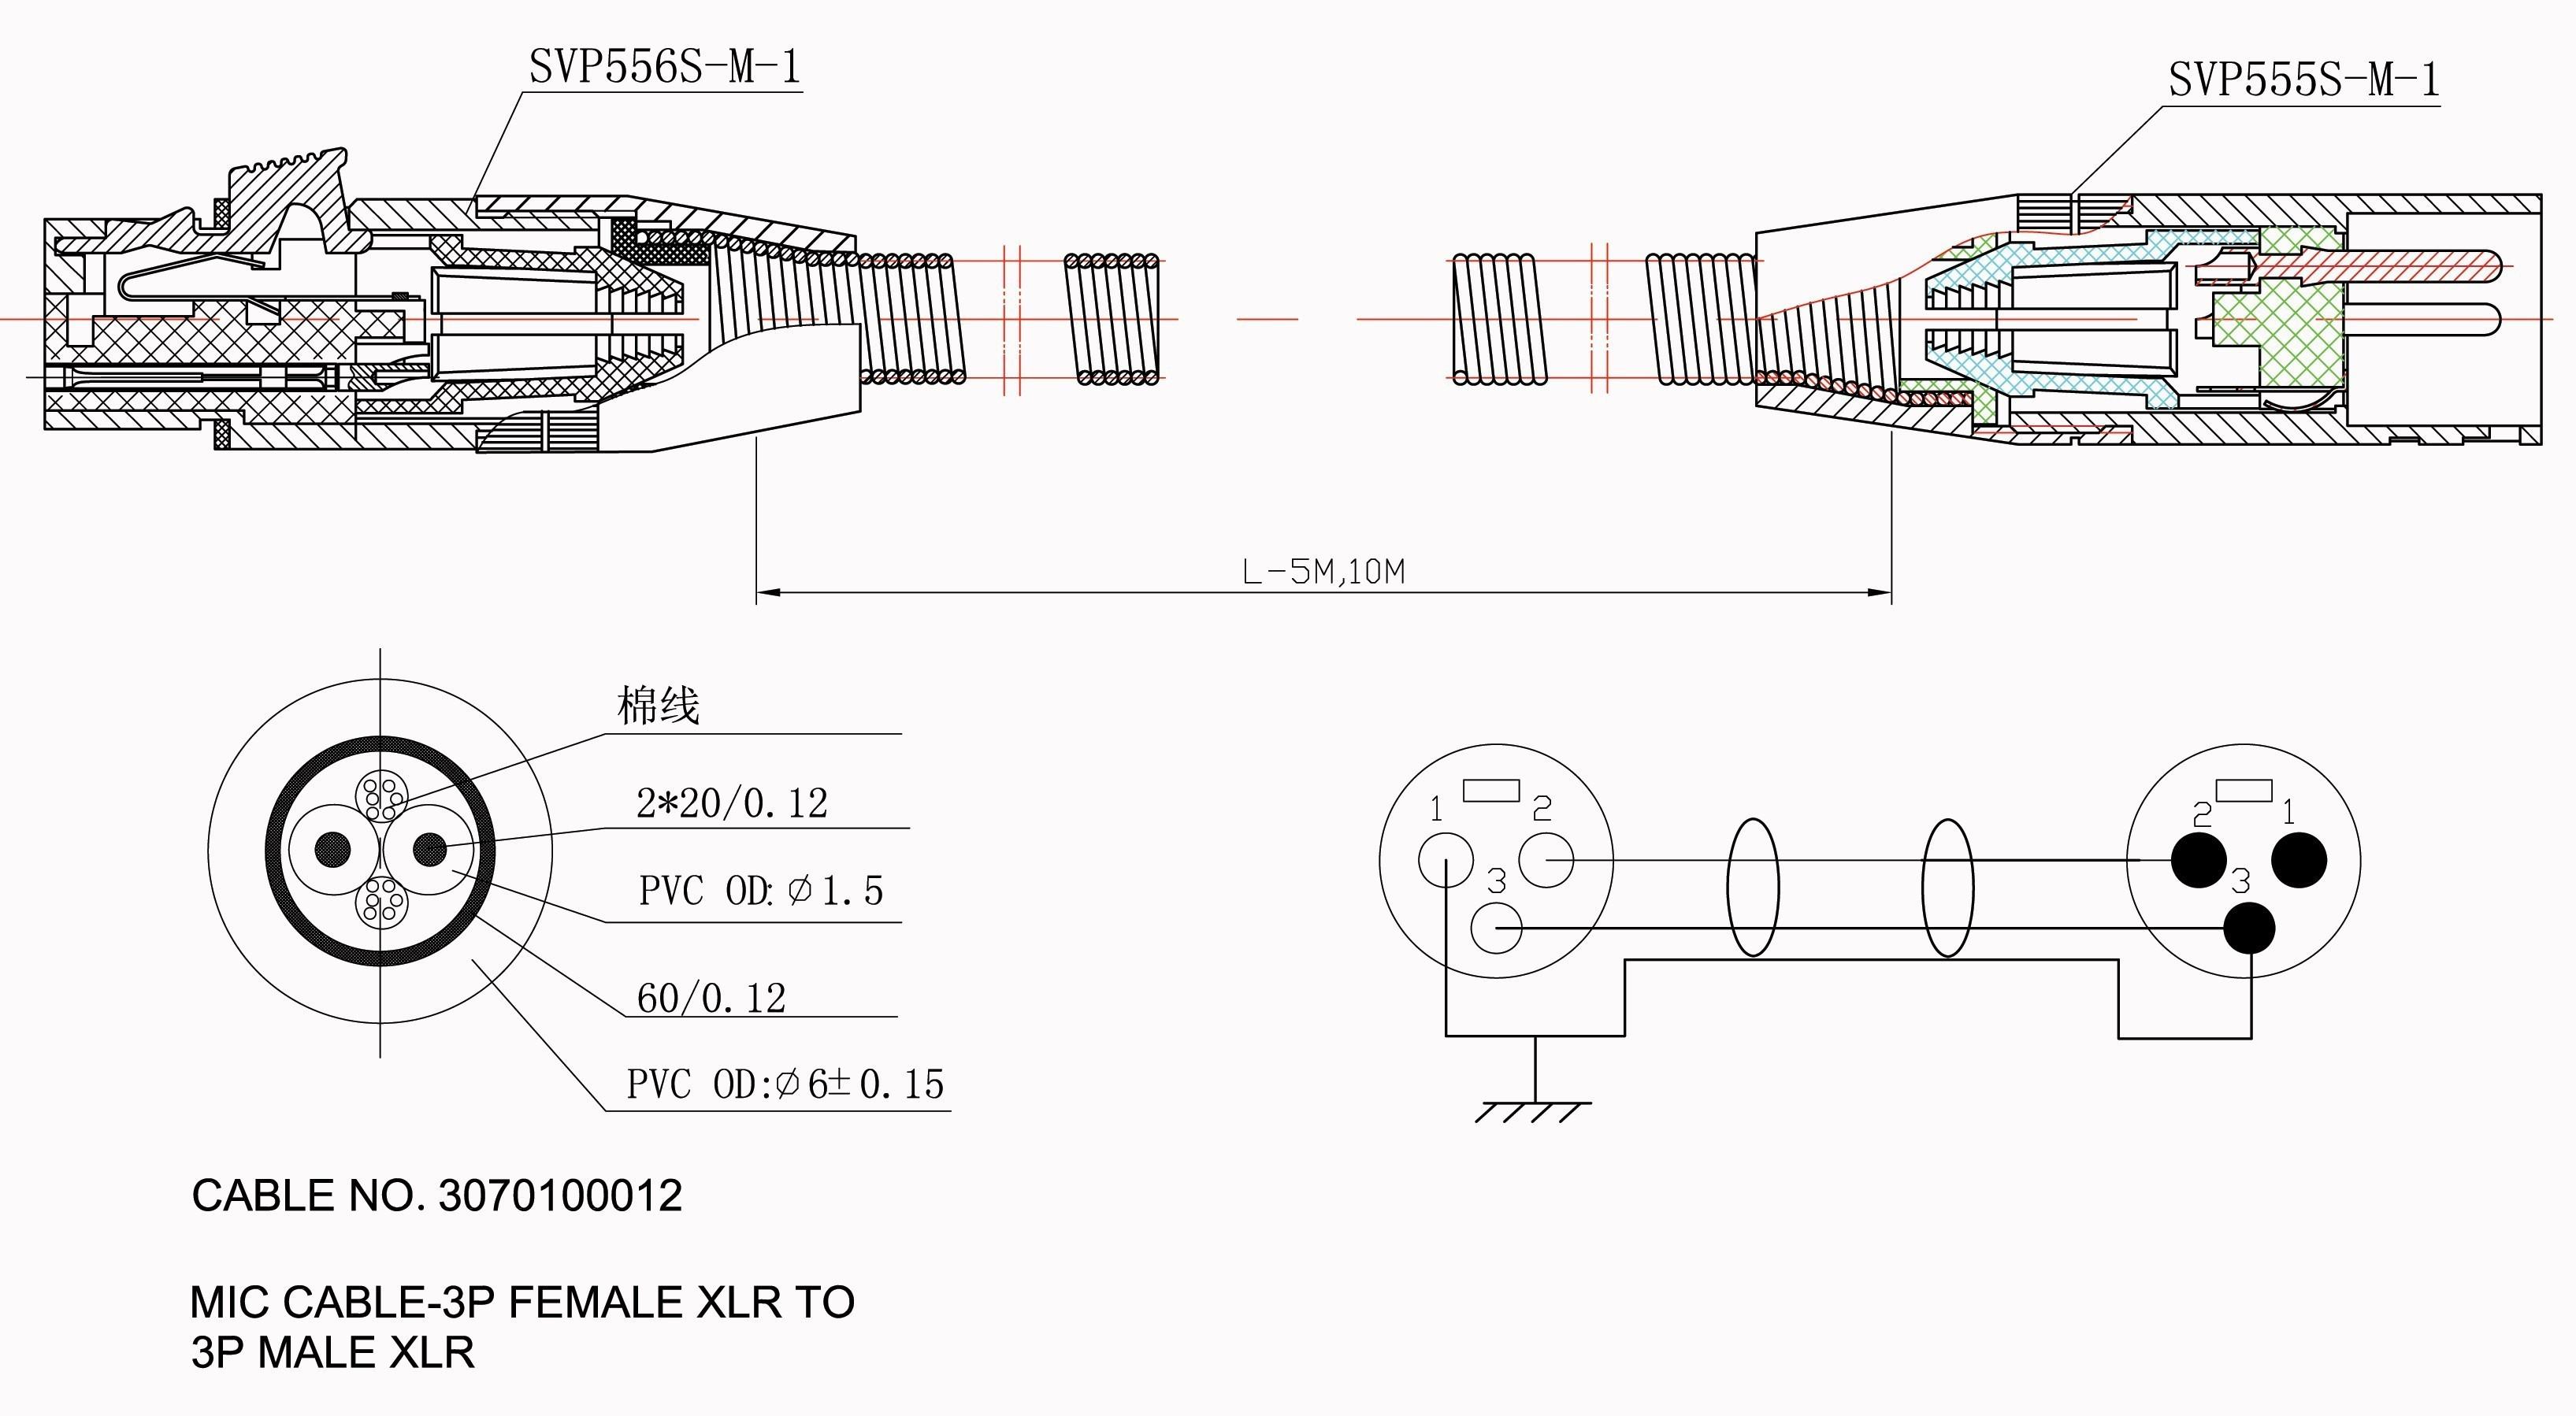 Electric Furnace Wiring Diagram Ge Gas Furnace Wiring Diagram Inspirationa General Electric Ac Motor Of Electric Furnace Wiring Diagram